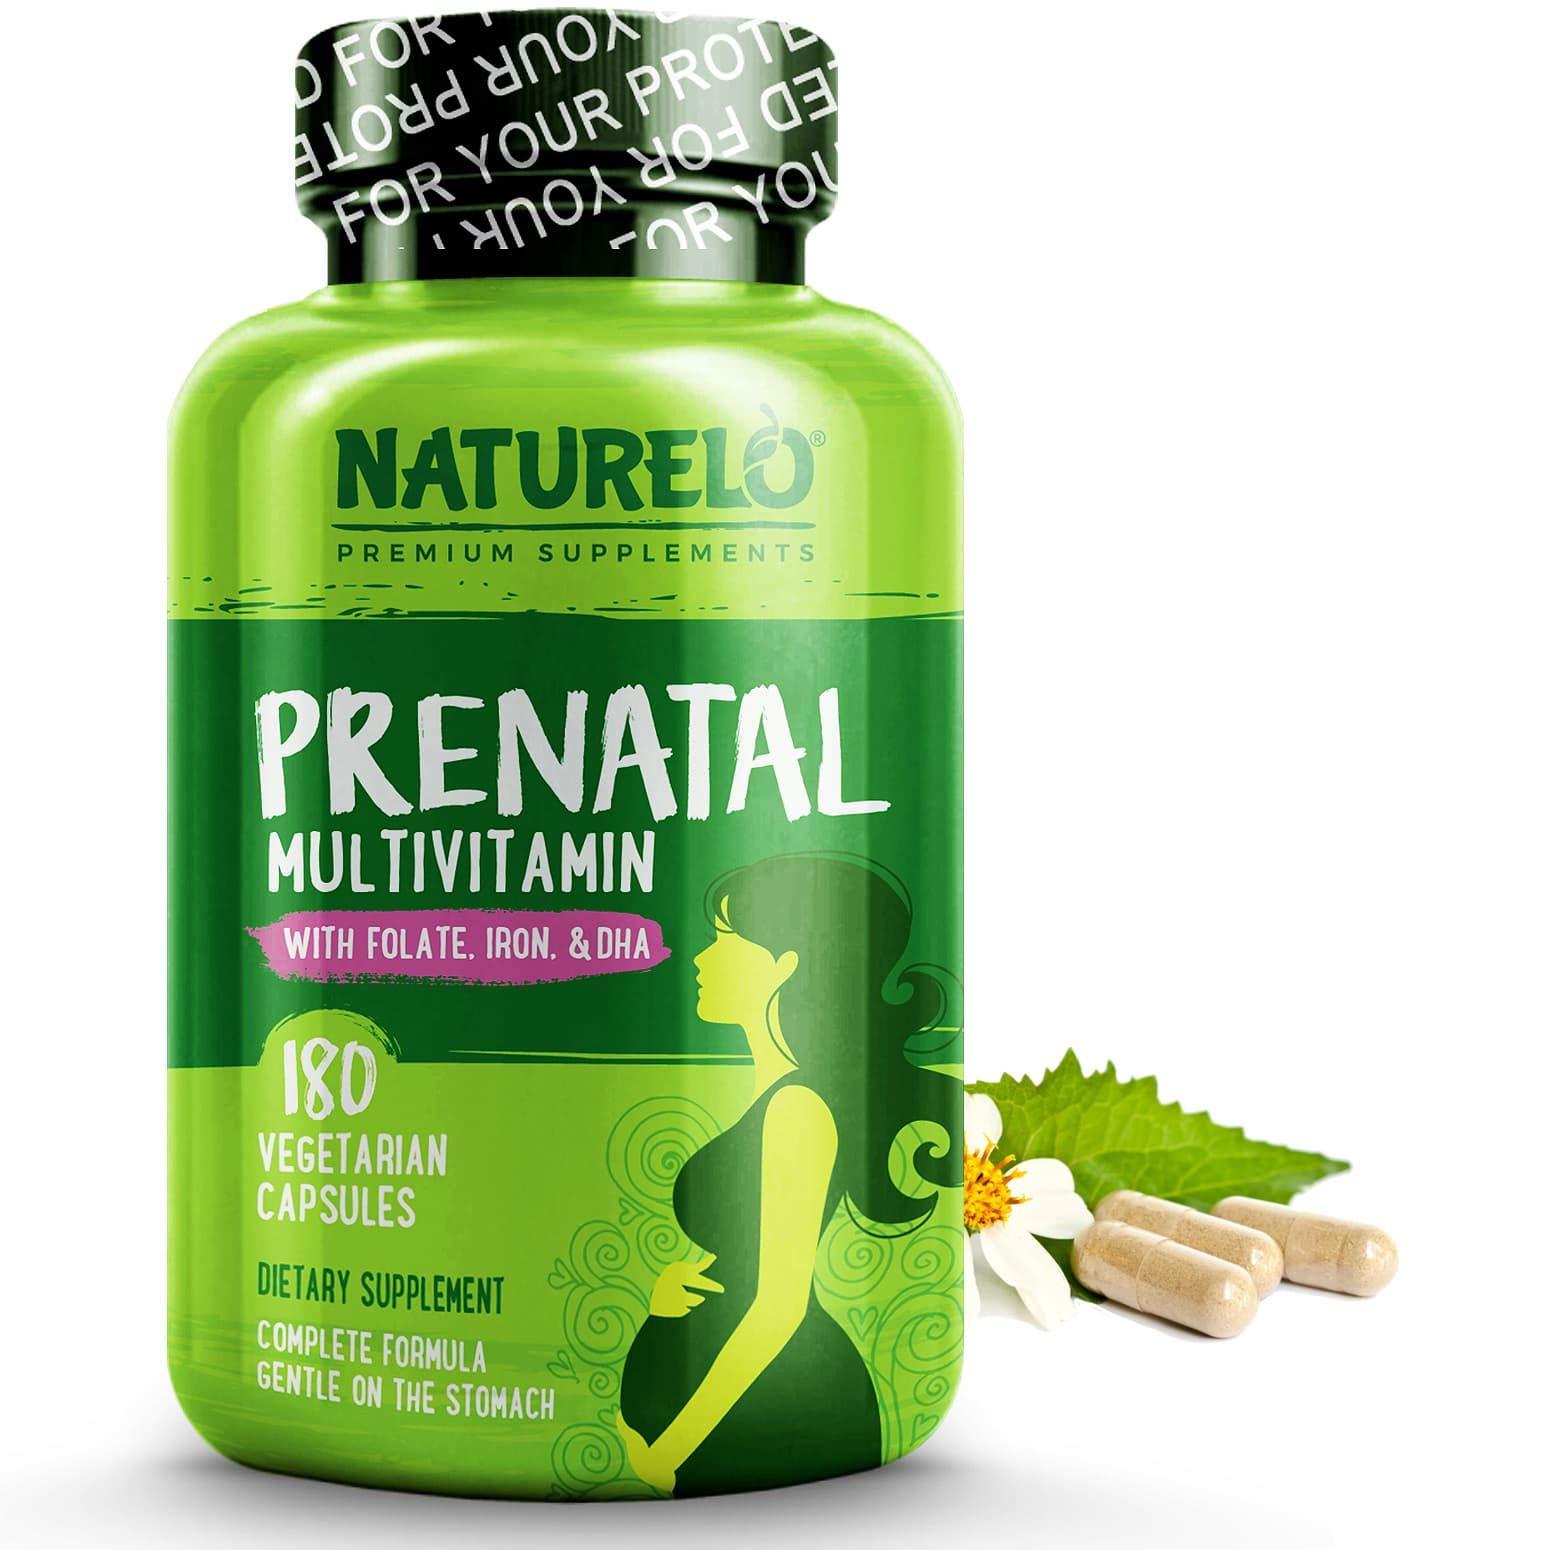 NATURELO Prenatal Whole Food Multivitamin - with Natural Iron, Folate and Calcium - Vegan & Vegetarian - Non-GMO - Gluten Free - 180 Capsules | 2 Month Supply